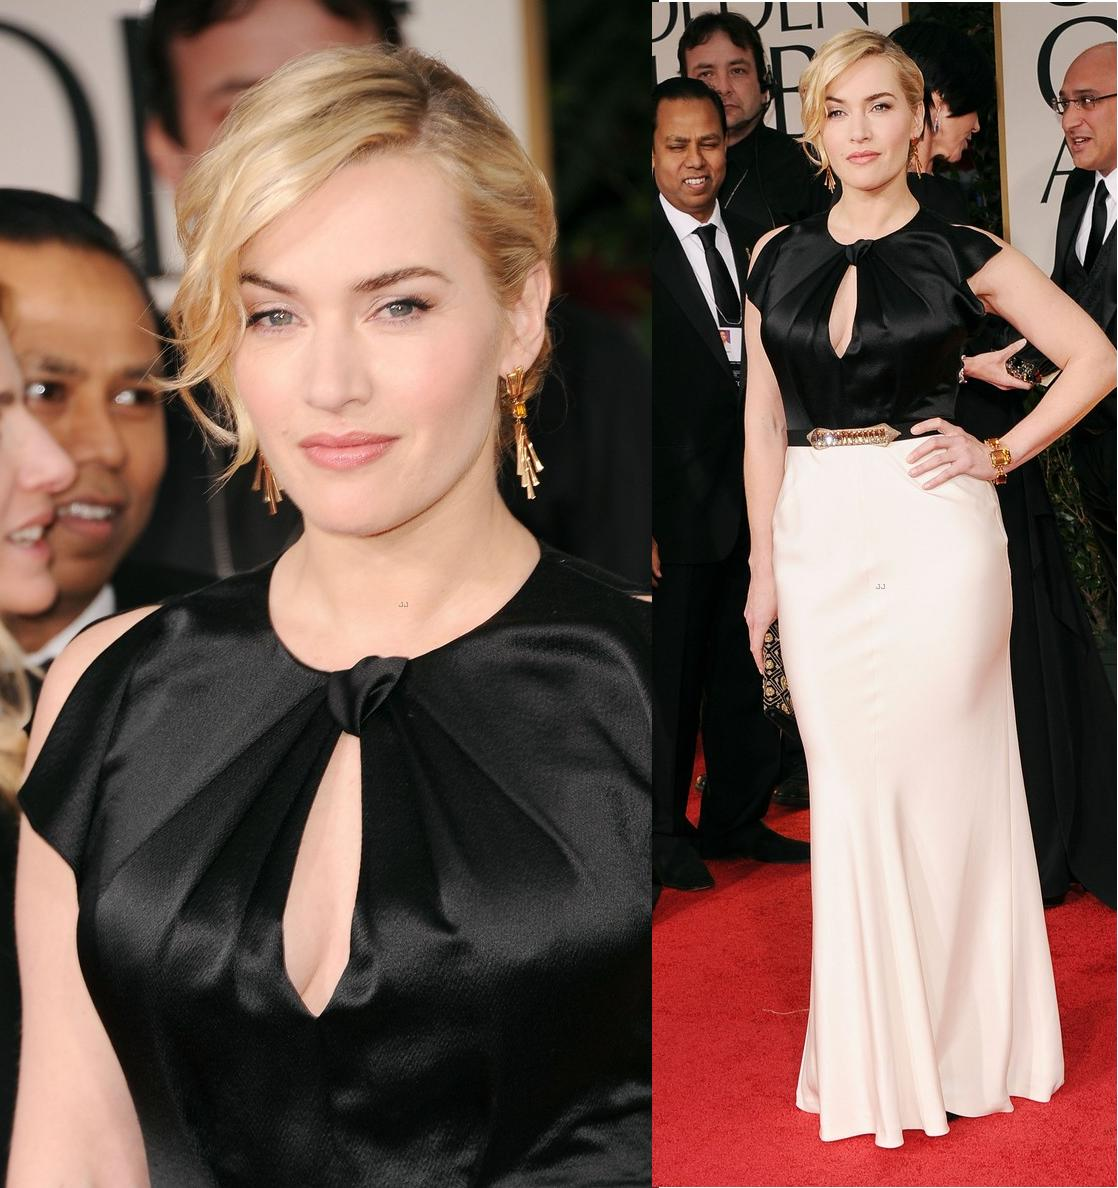 http://4.bp.blogspot.com/-hudH_dtym2Q/TxQ3dZS4ieI/AAAAAAAAERI/H-xKU6cTC2g/s1600/Kate+Winslet+In+Jenny+Packham.jpg